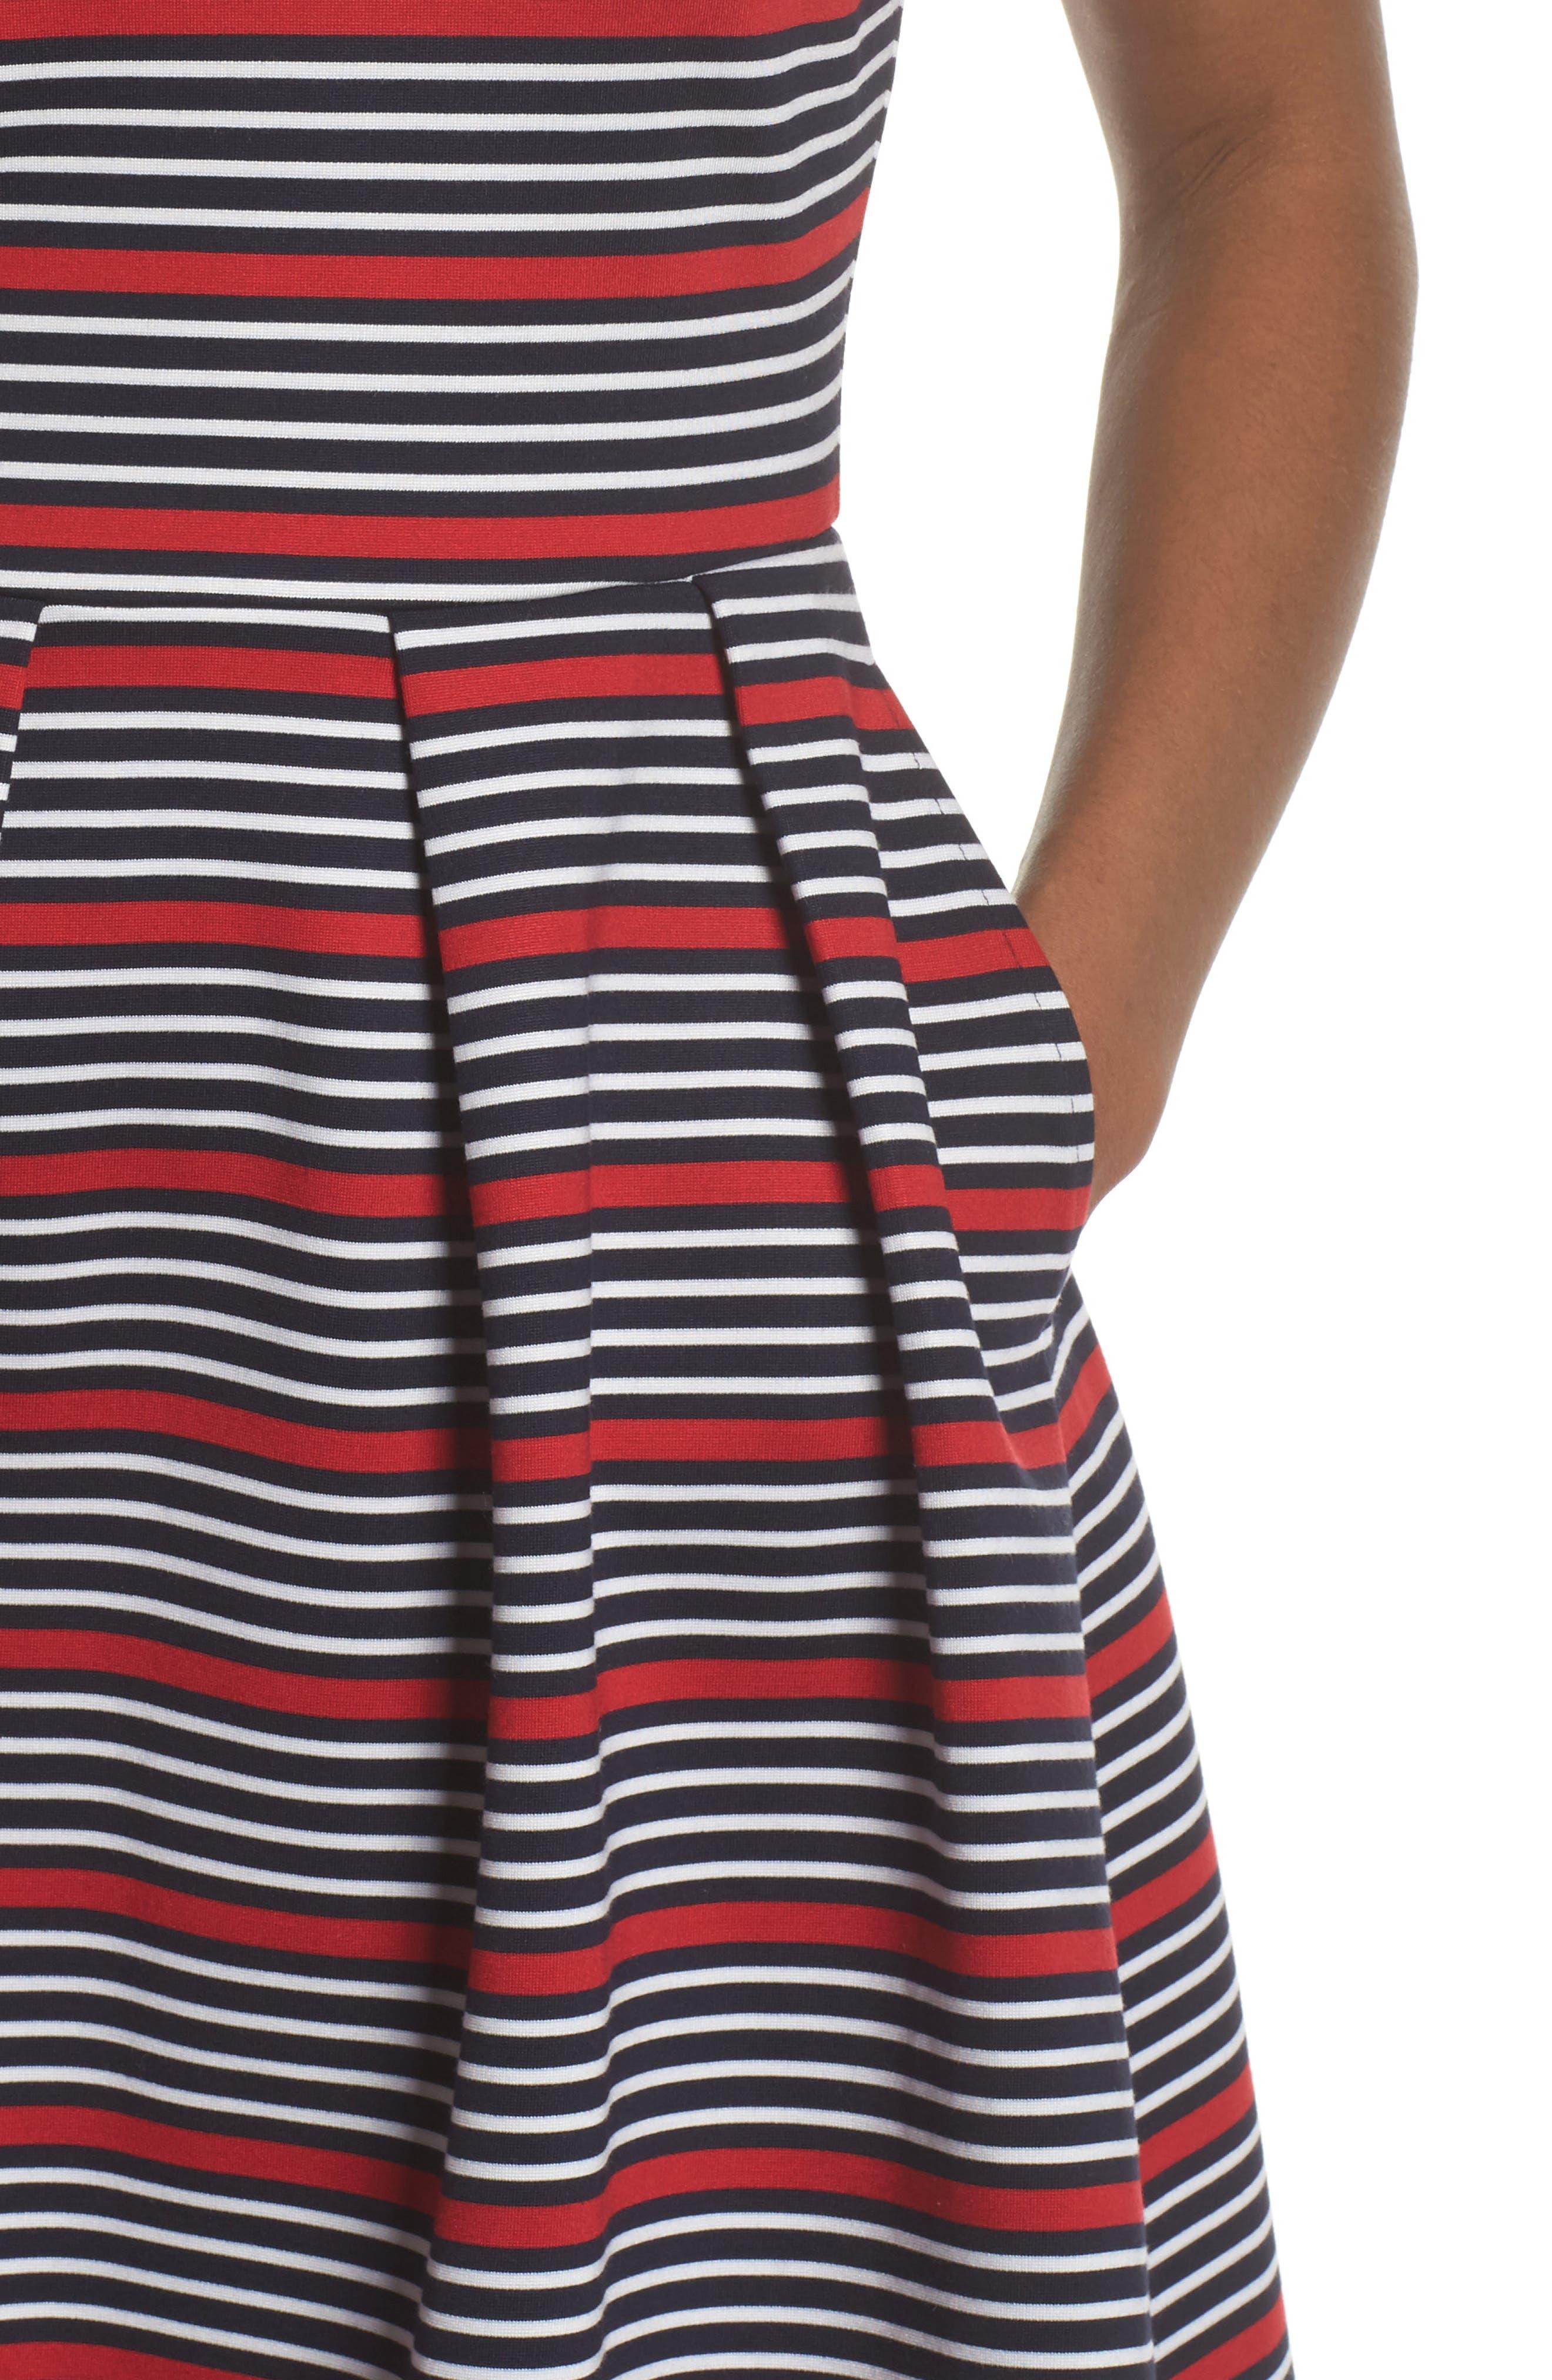 Scarlette Stripe Fit & Flare Dress,                             Alternate thumbnail 4, color,                             Navy/ Red/ White Stripe